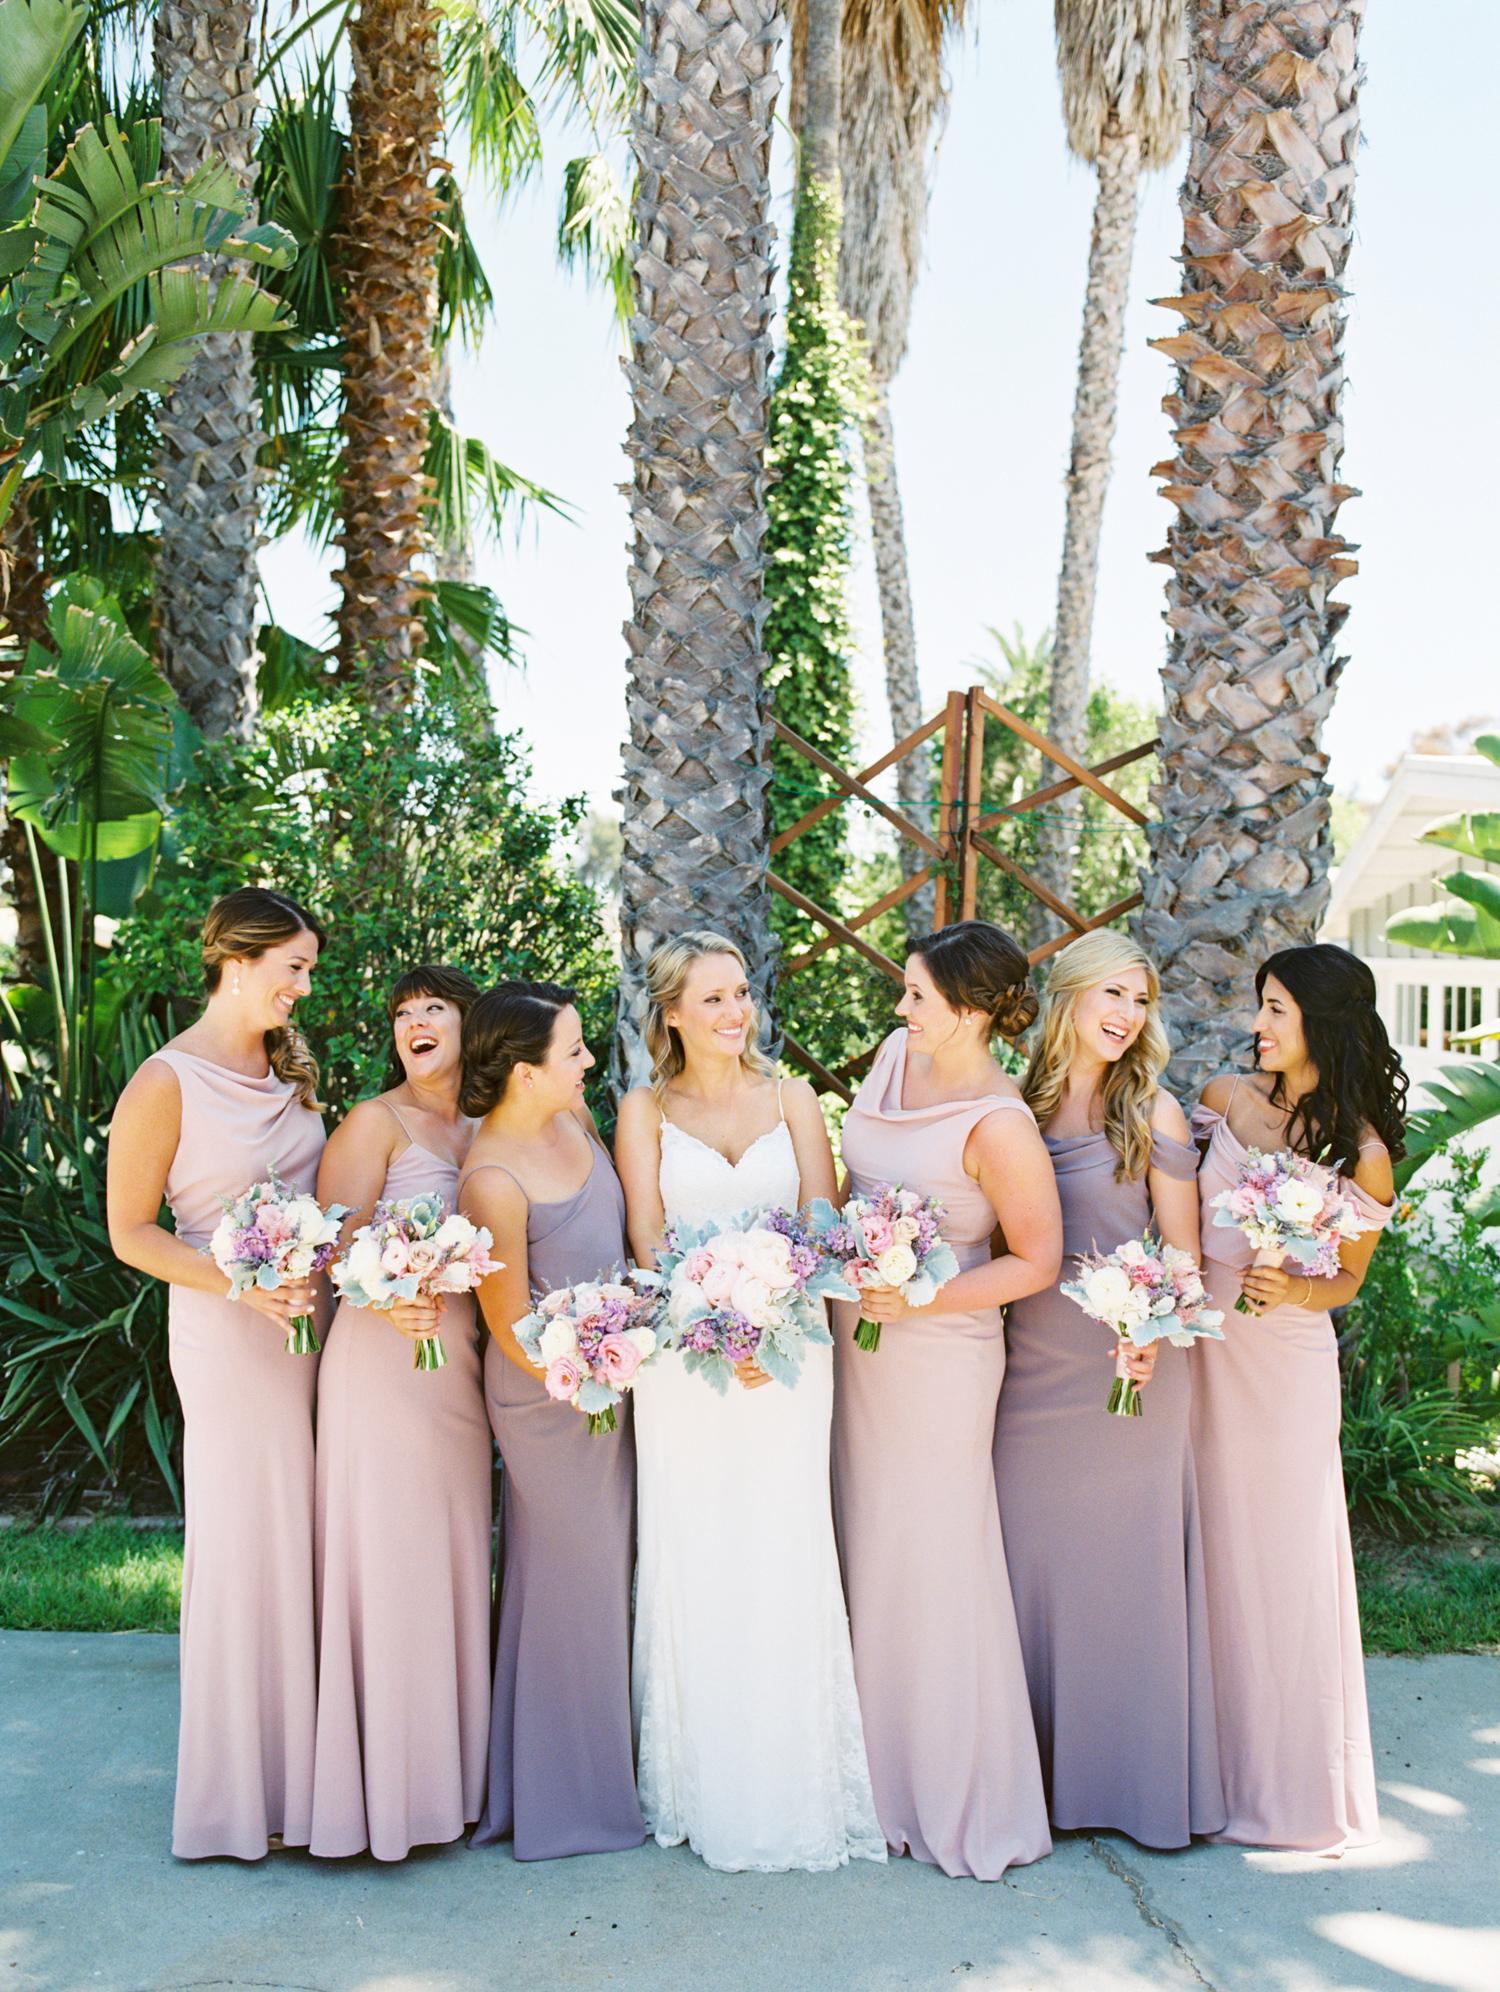 050-Jen-Wojcik-Photography-San-Diego-Wedding-Photographer.jpg